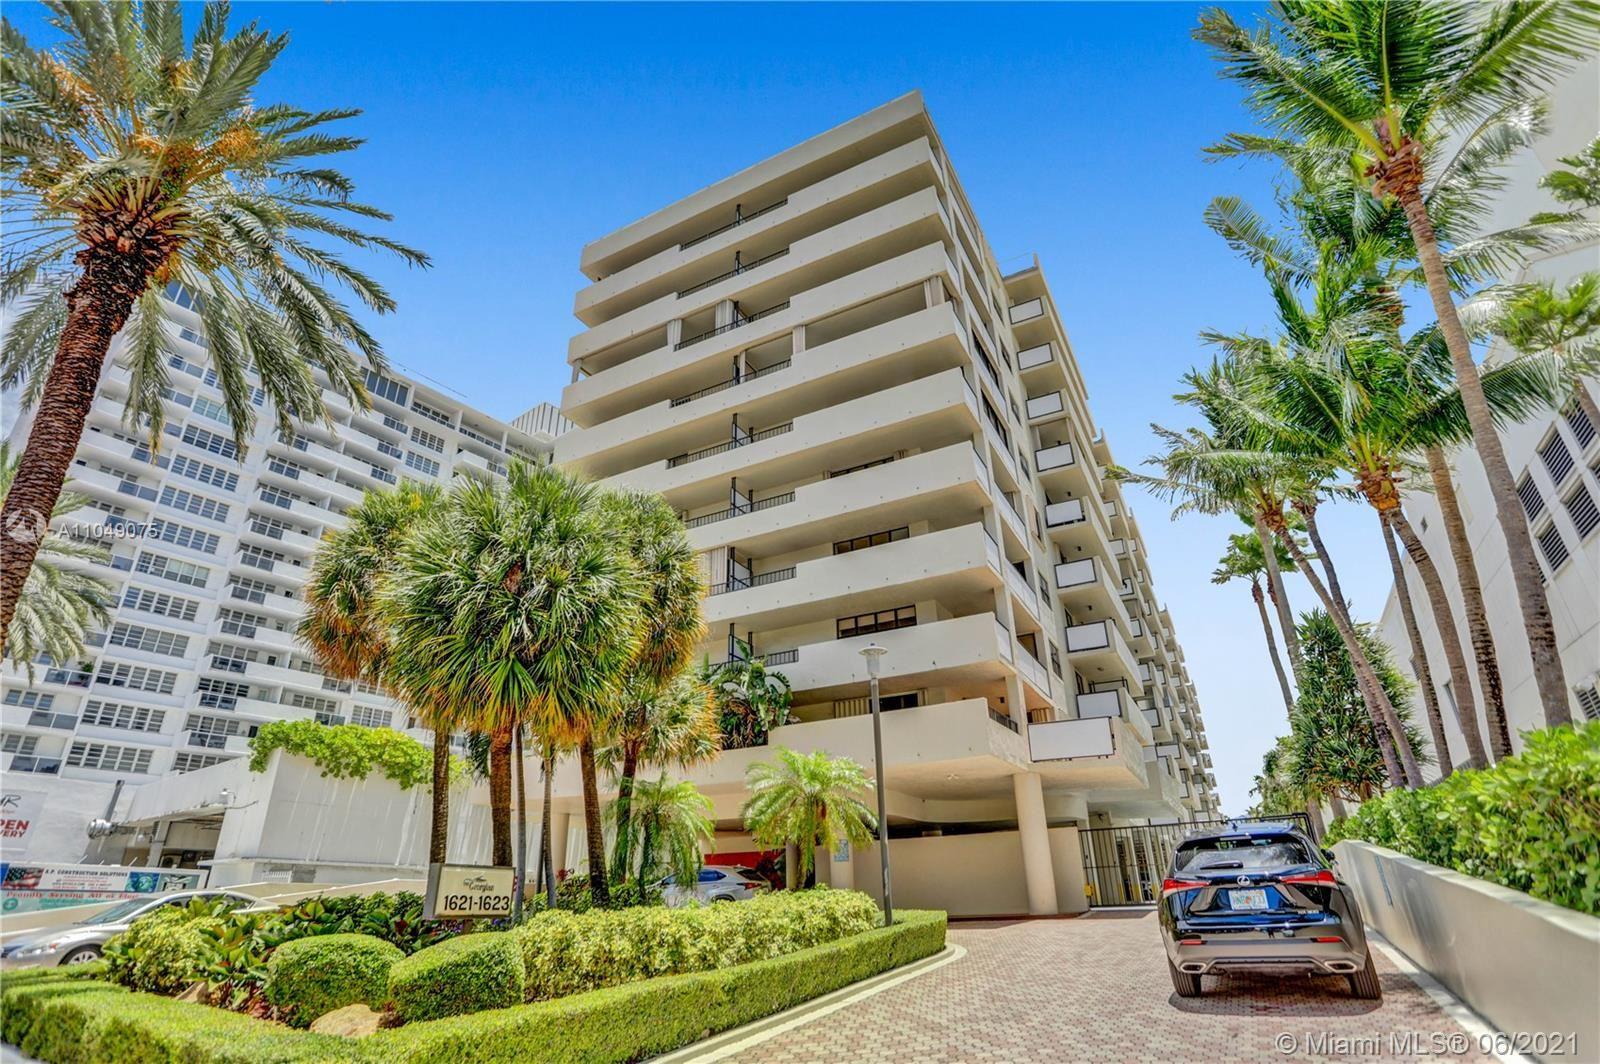 Photo of 1623 Collins Ave #816, Miami Beach, FL 33139 (MLS # A11049075)